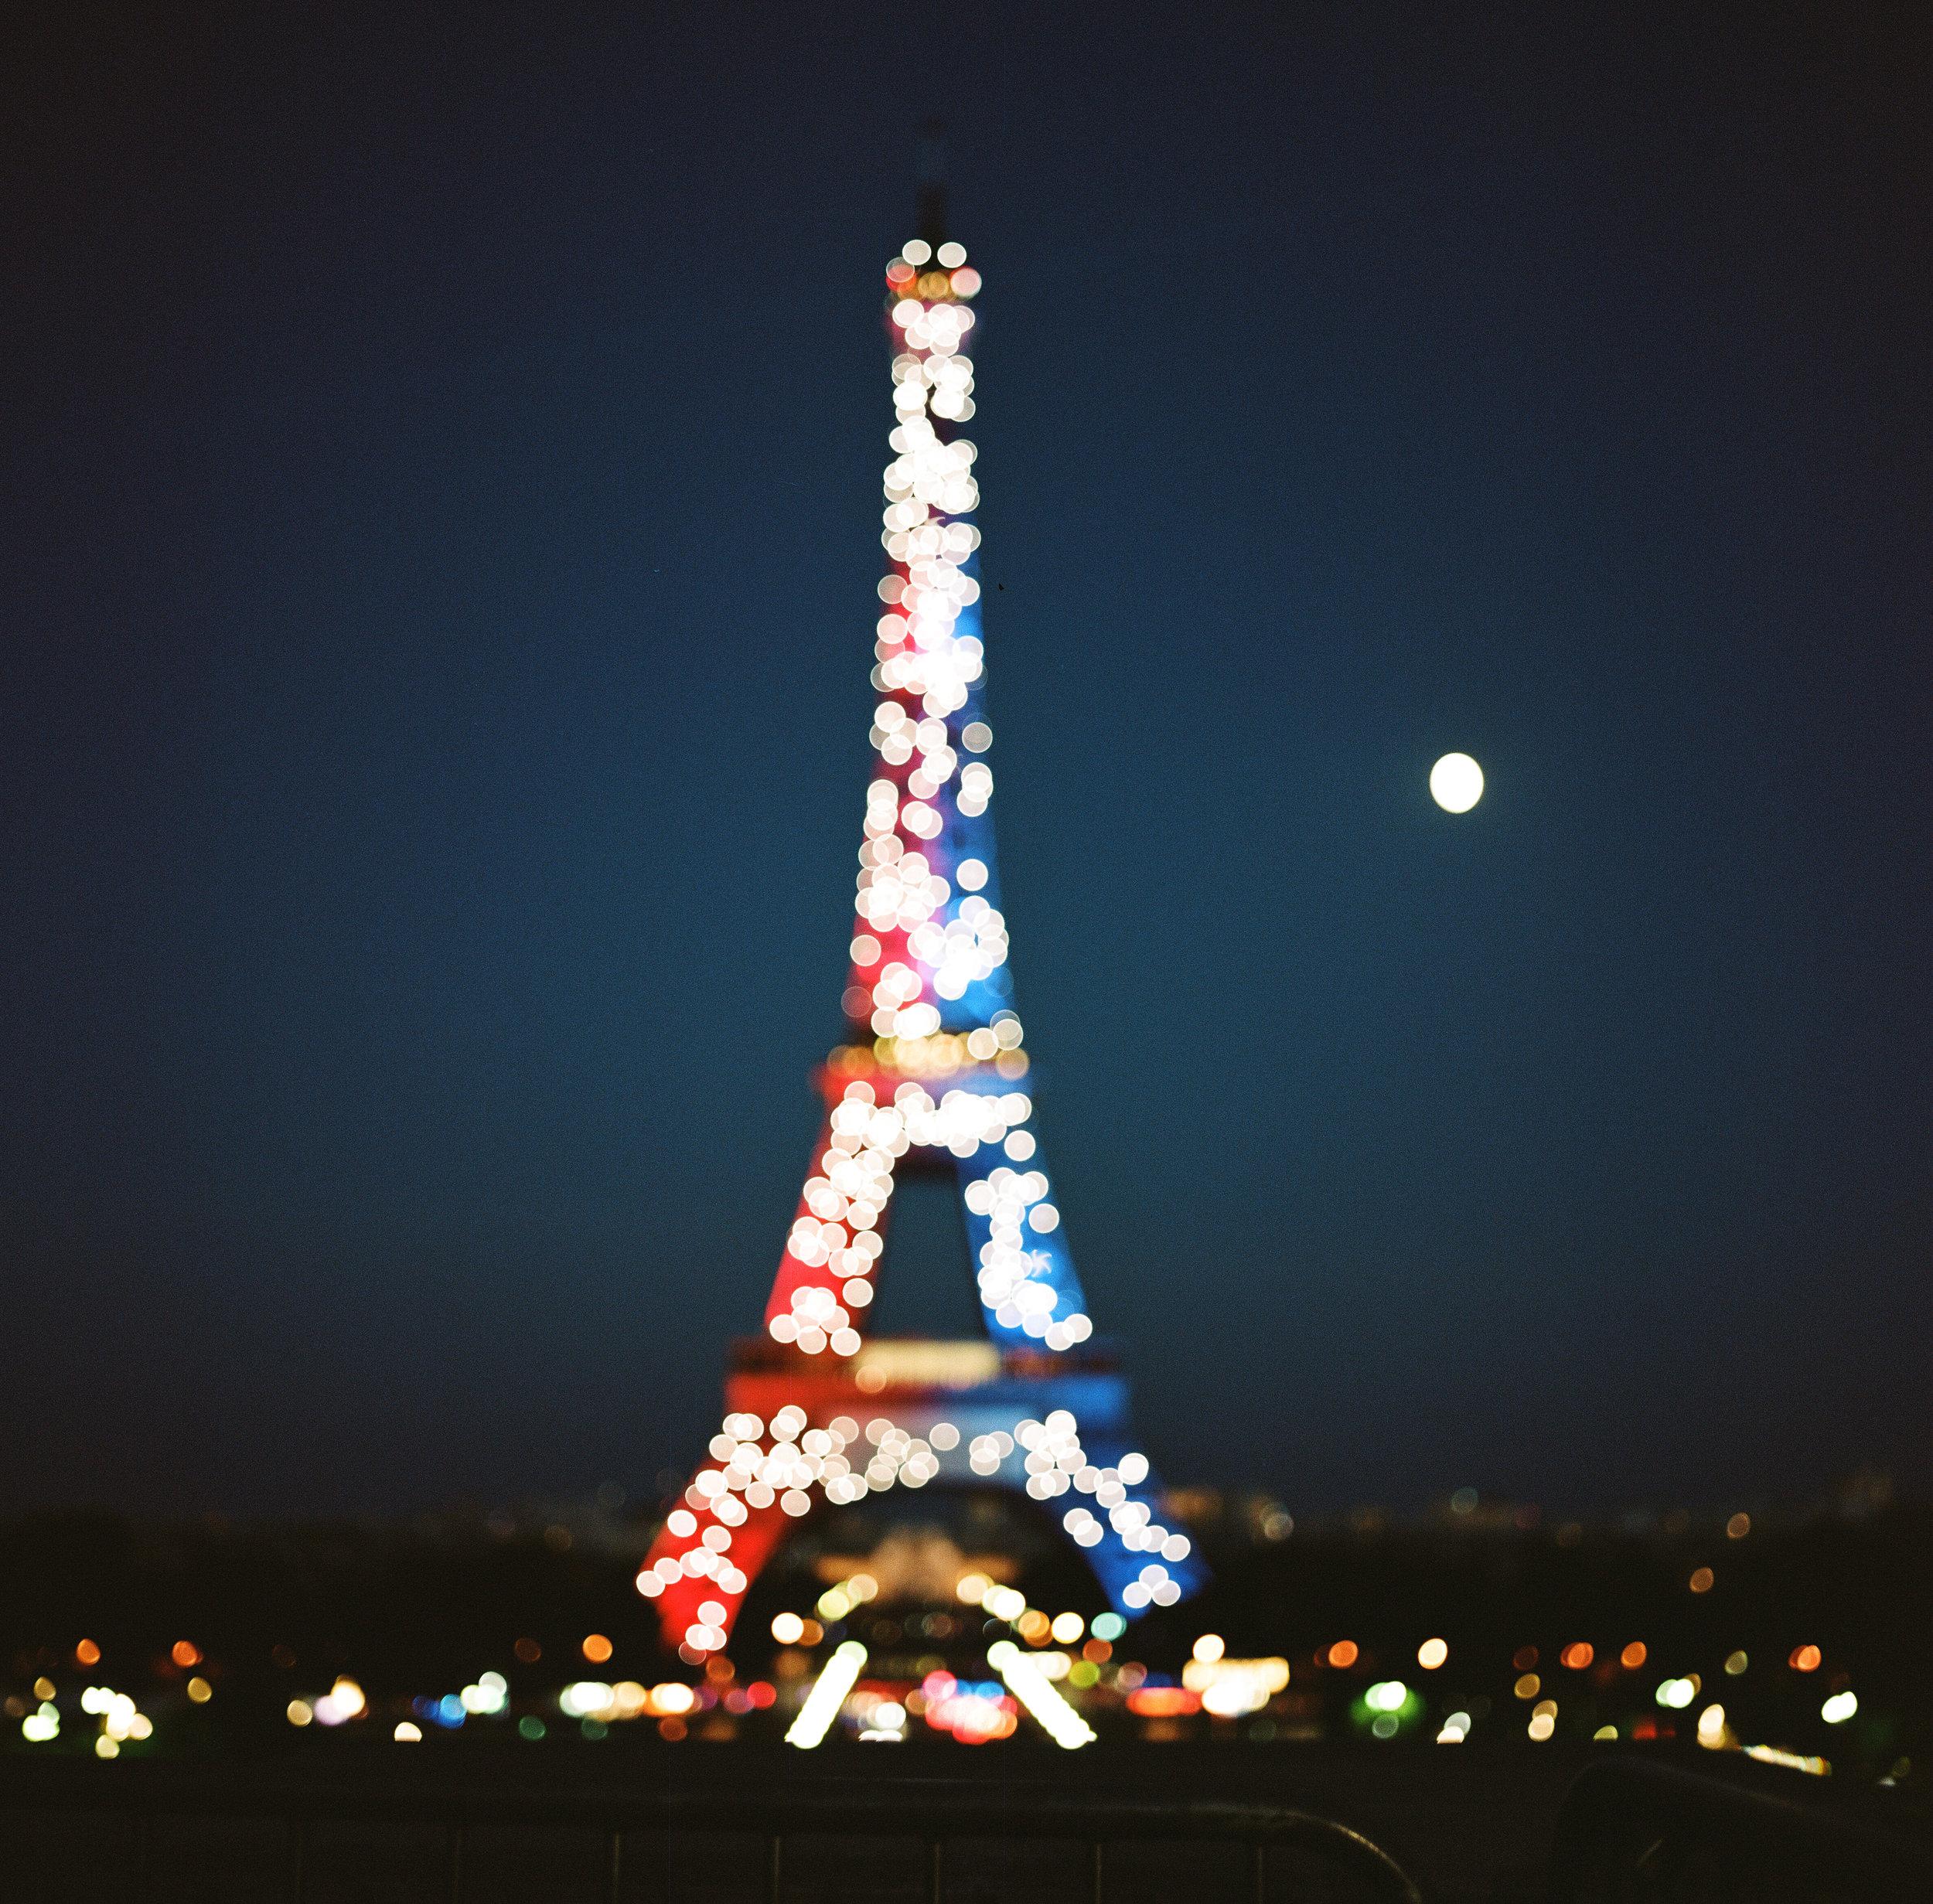 ParisFilm_2017_AdamDillon_000096250012.jpg